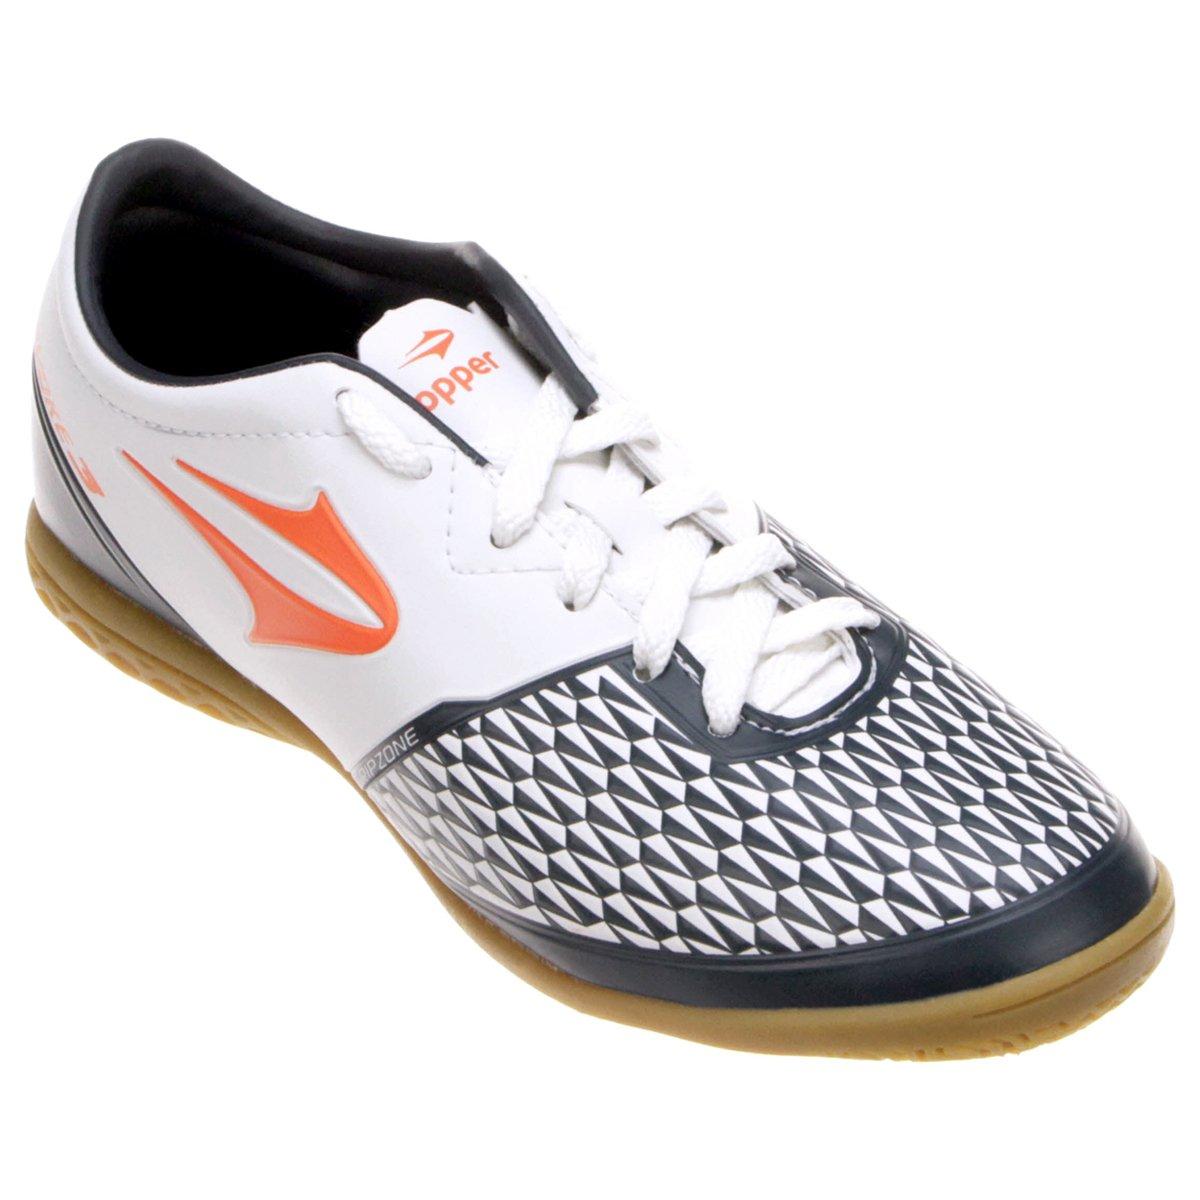 933d75eb86 Chuteira Topper Provoke 3 Futsal - Compre Agora